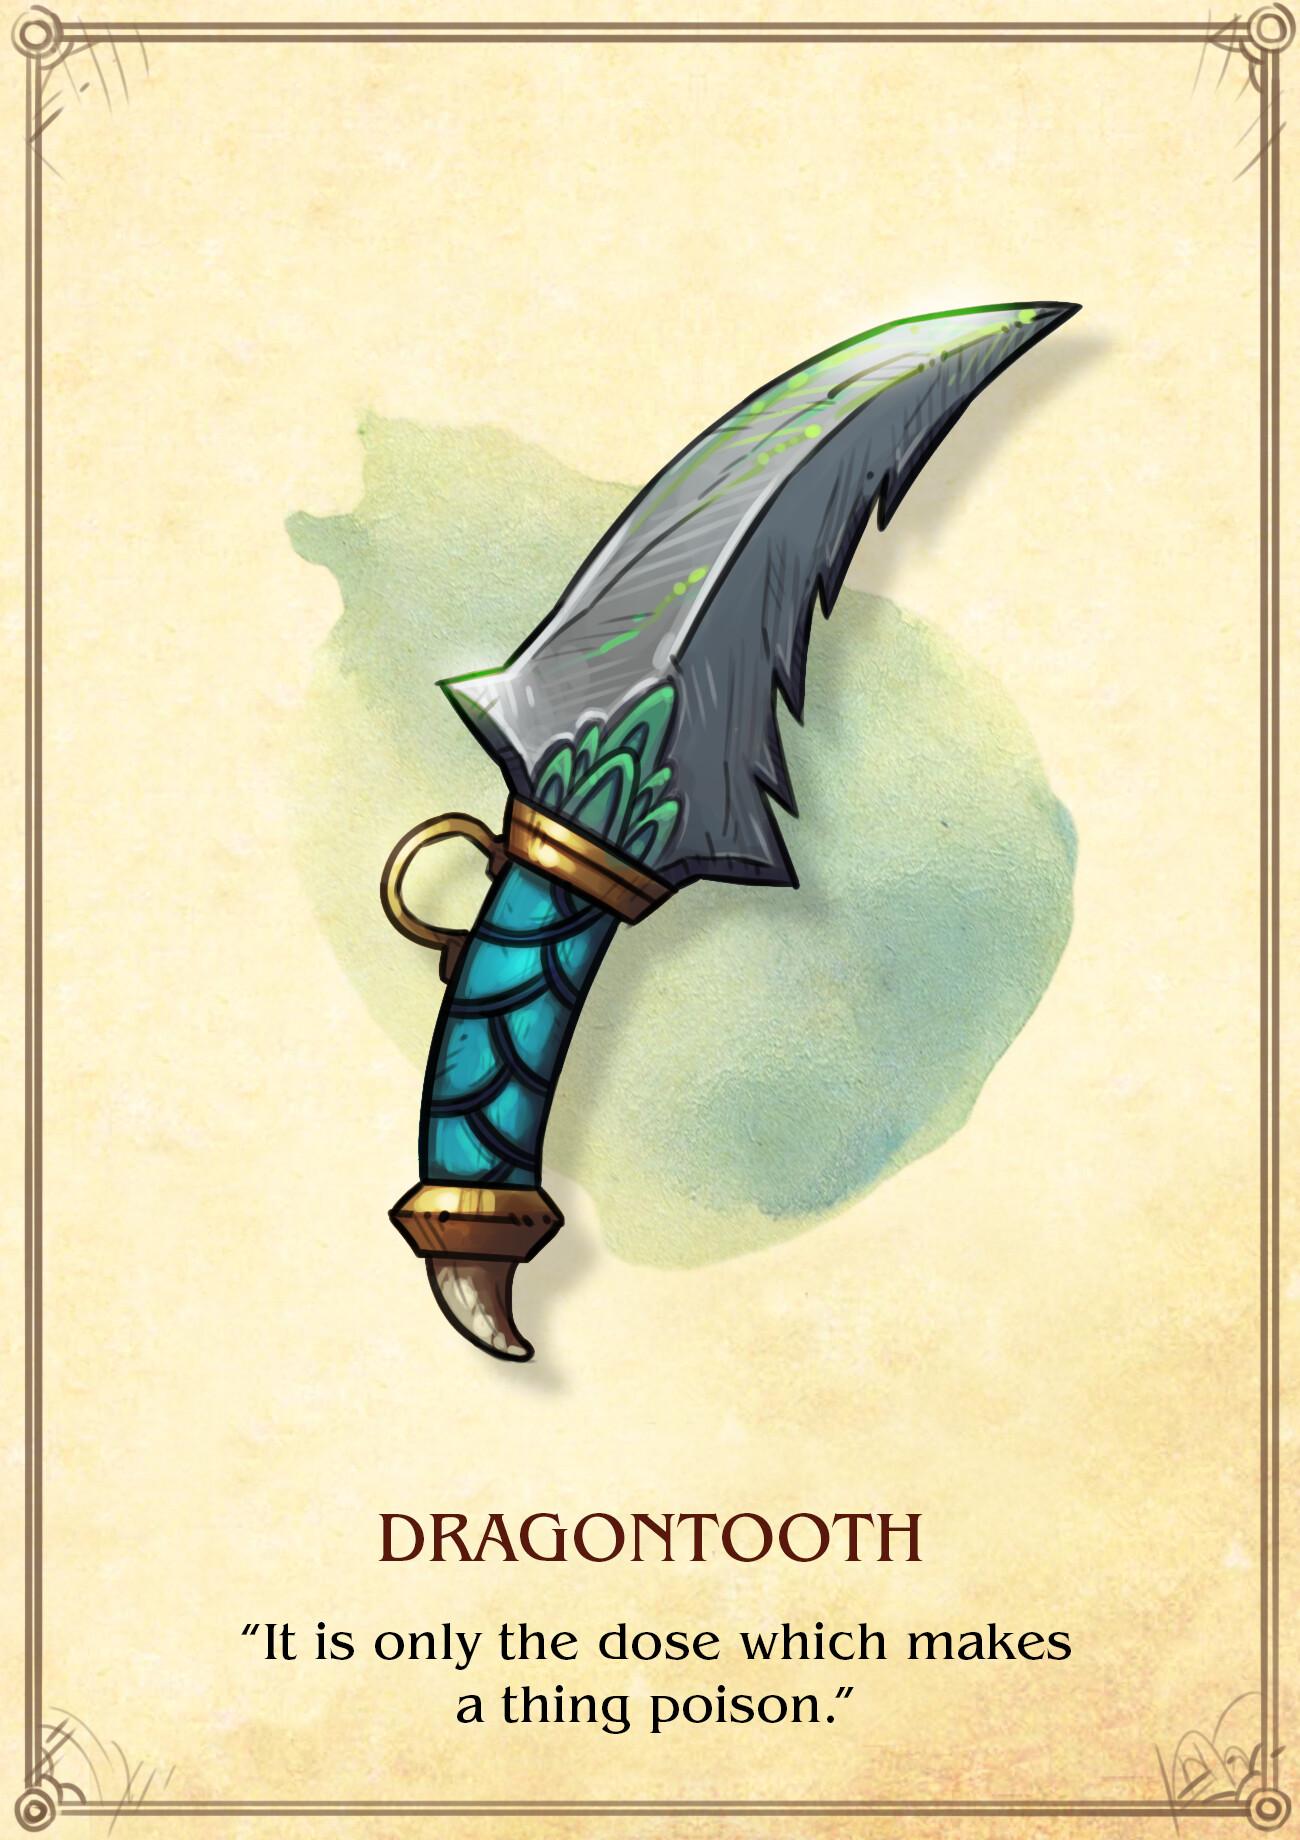 John muller dragontooth 04